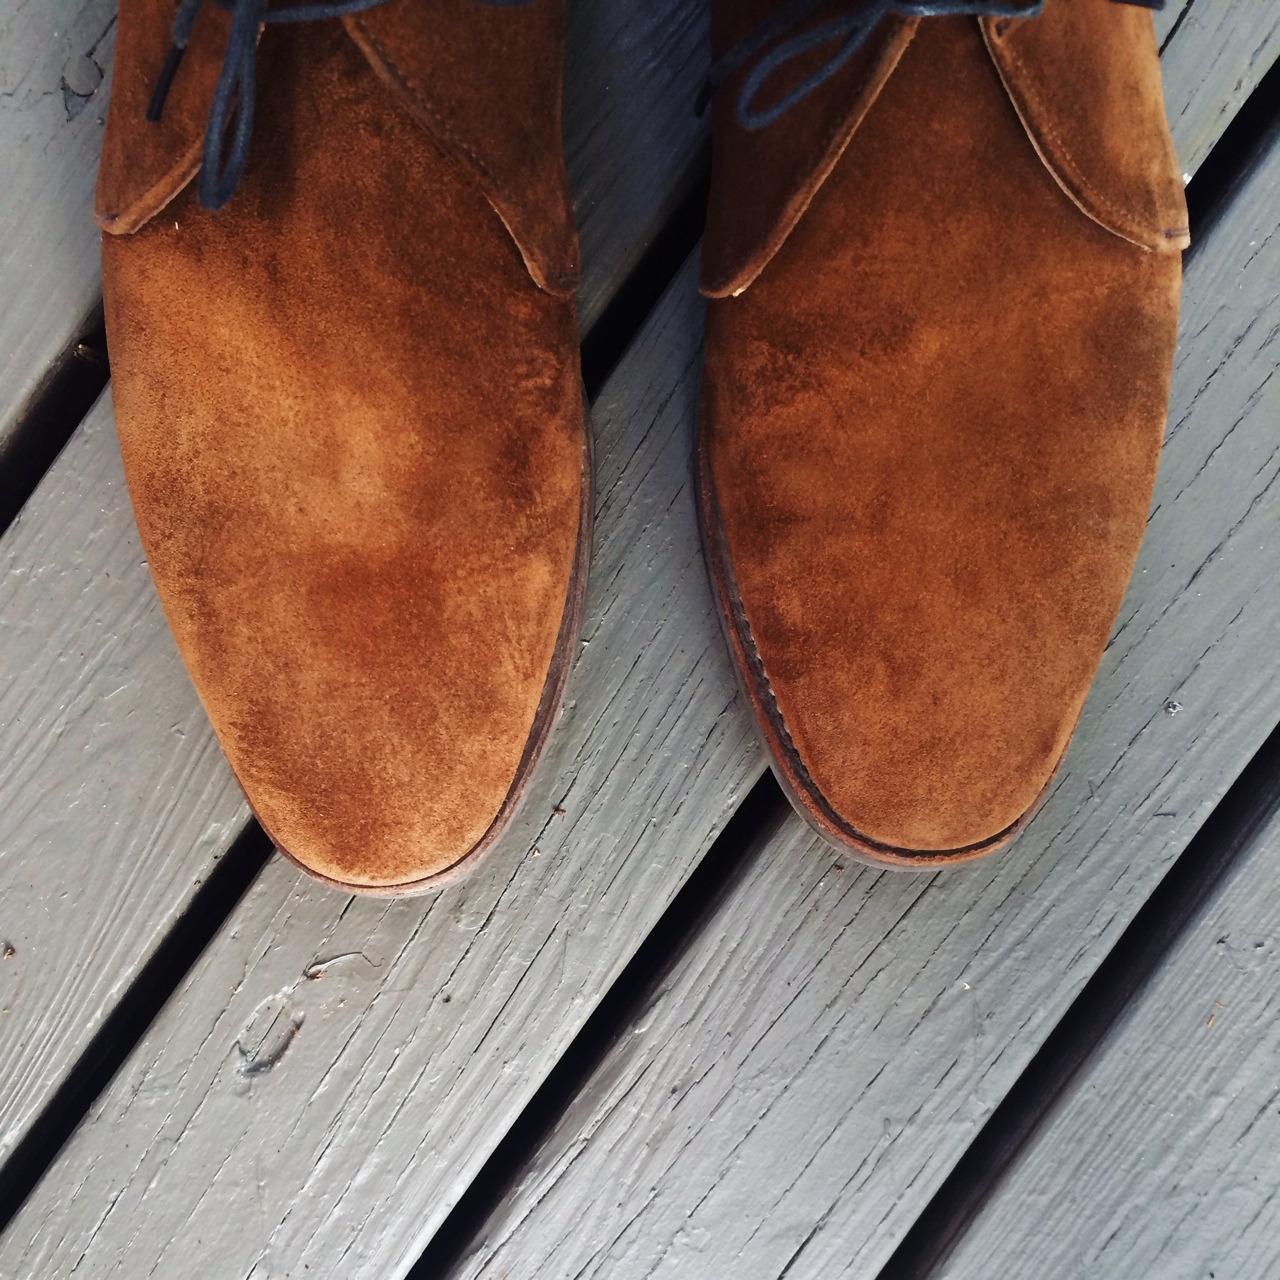 Please Mistreat Your Suede Shoes – Put